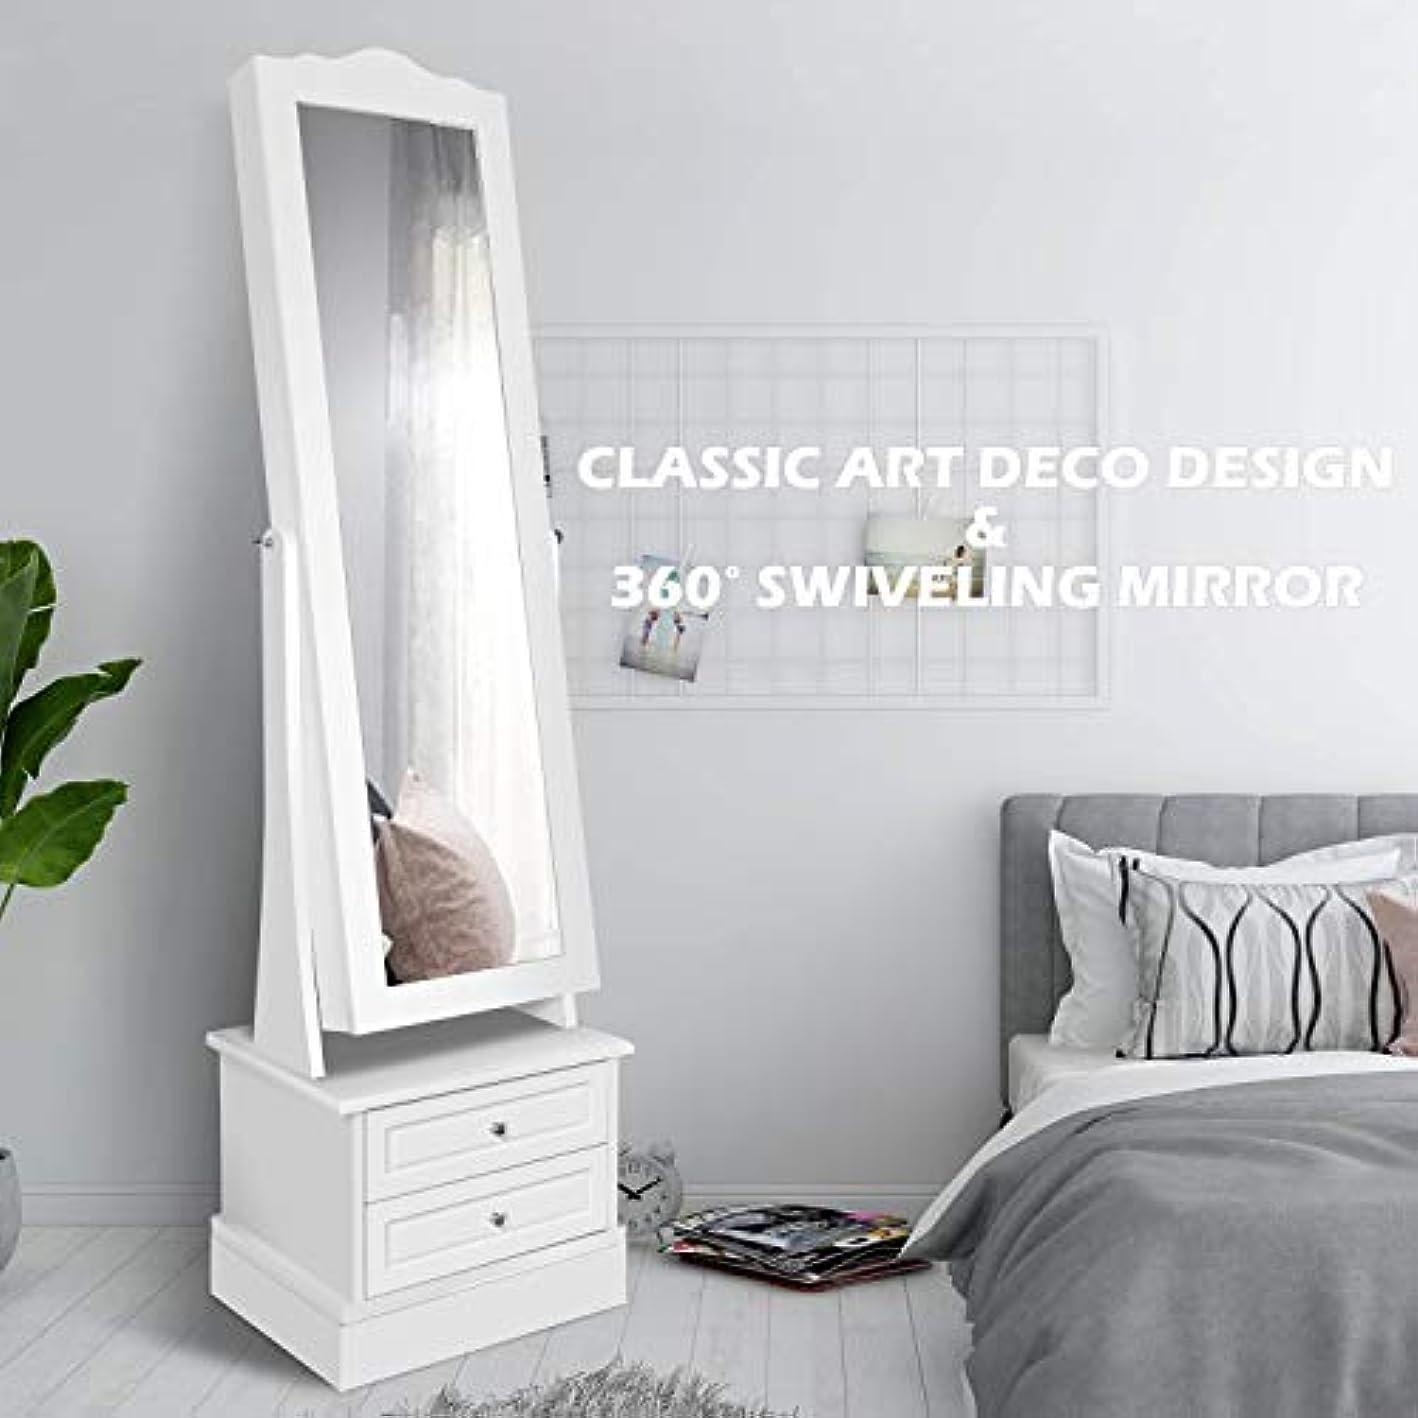 FUNKOCO Swiveling Mirror Jewelry Armoire,LED Jewelry Storage Cabinets,360°Rotating Jewelry Organizer - White